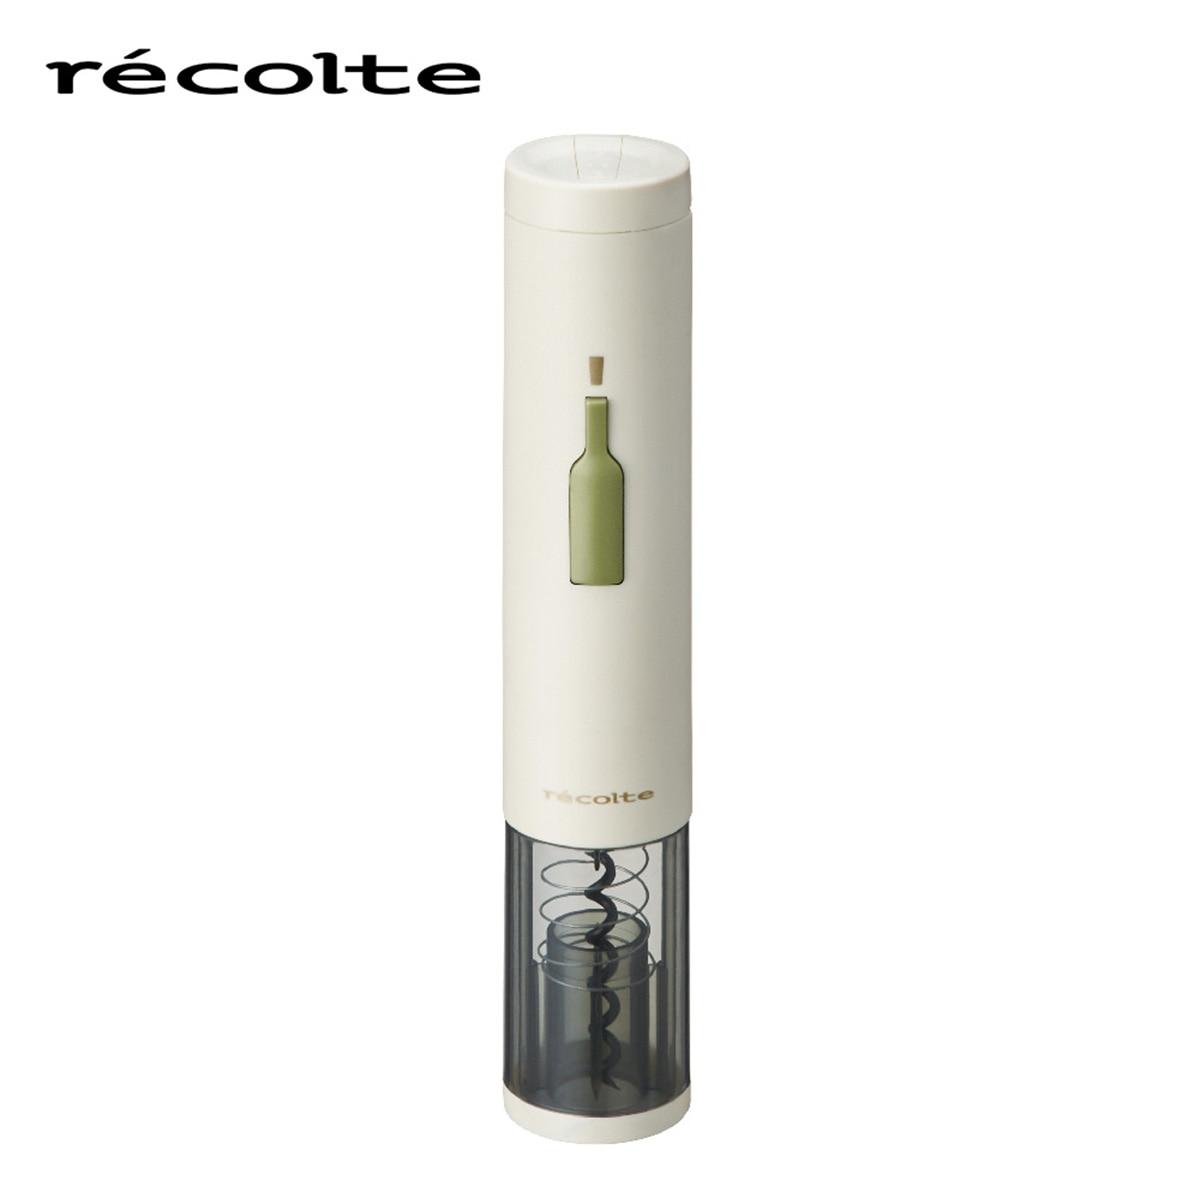 recolte(レコルト) イージーワインオープナー ホワイト EWO-2-BK